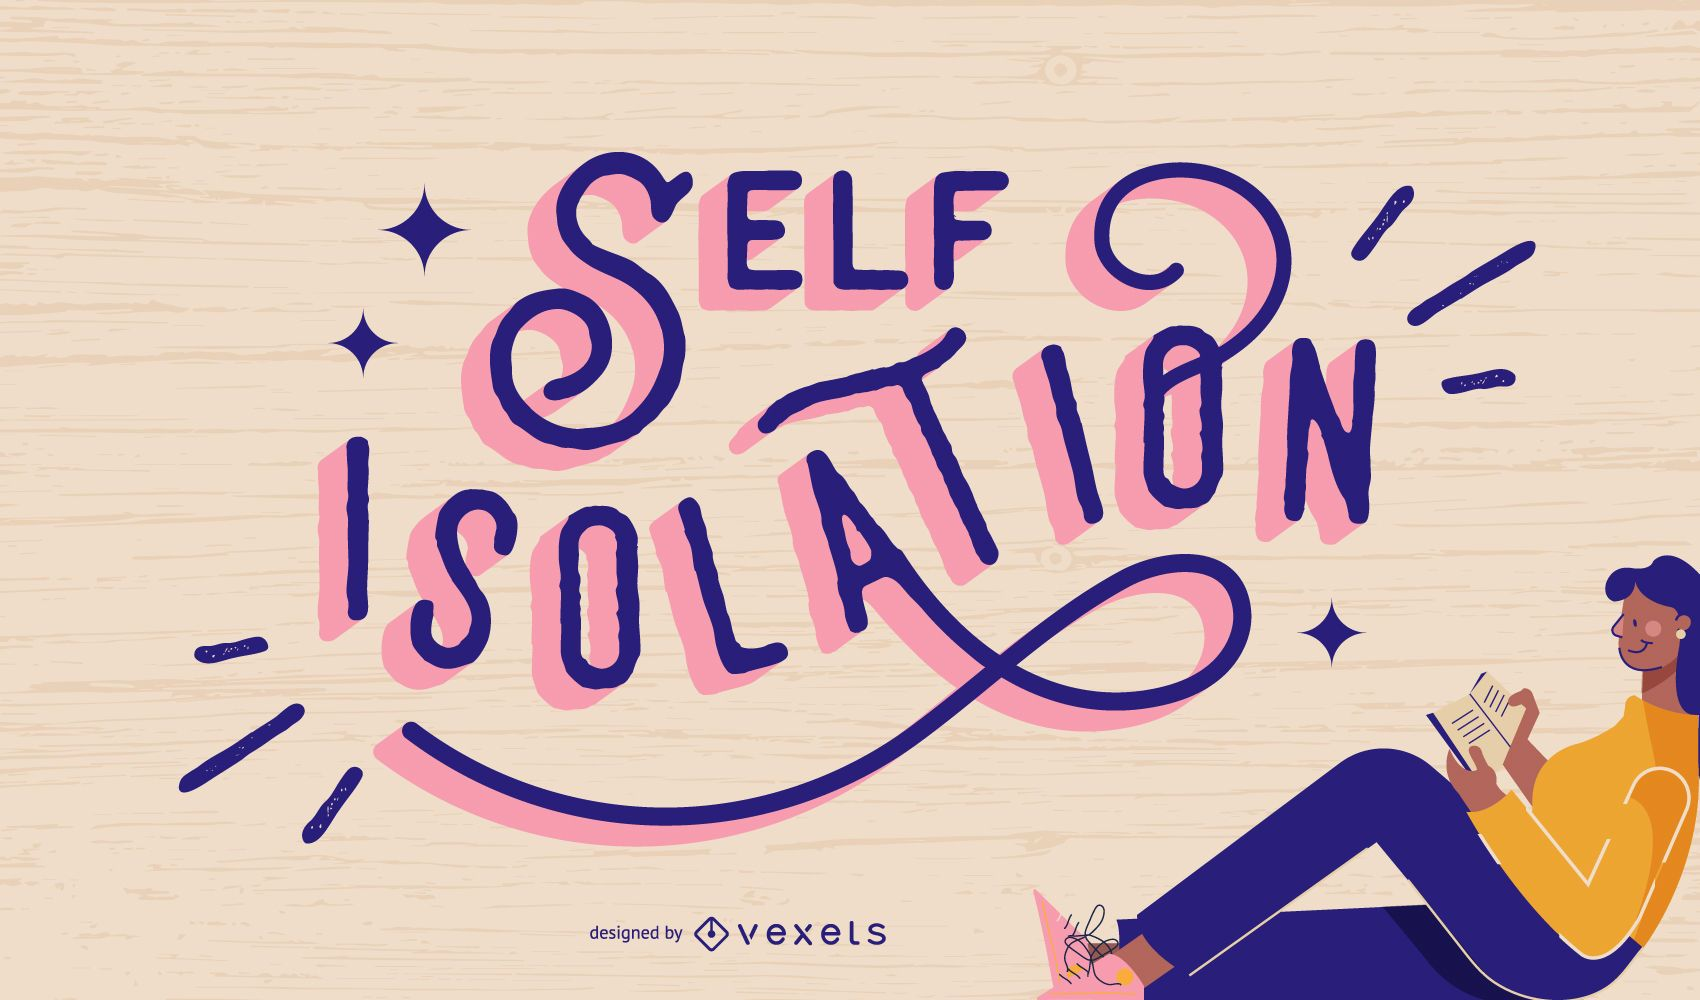 Self isolation lettering design